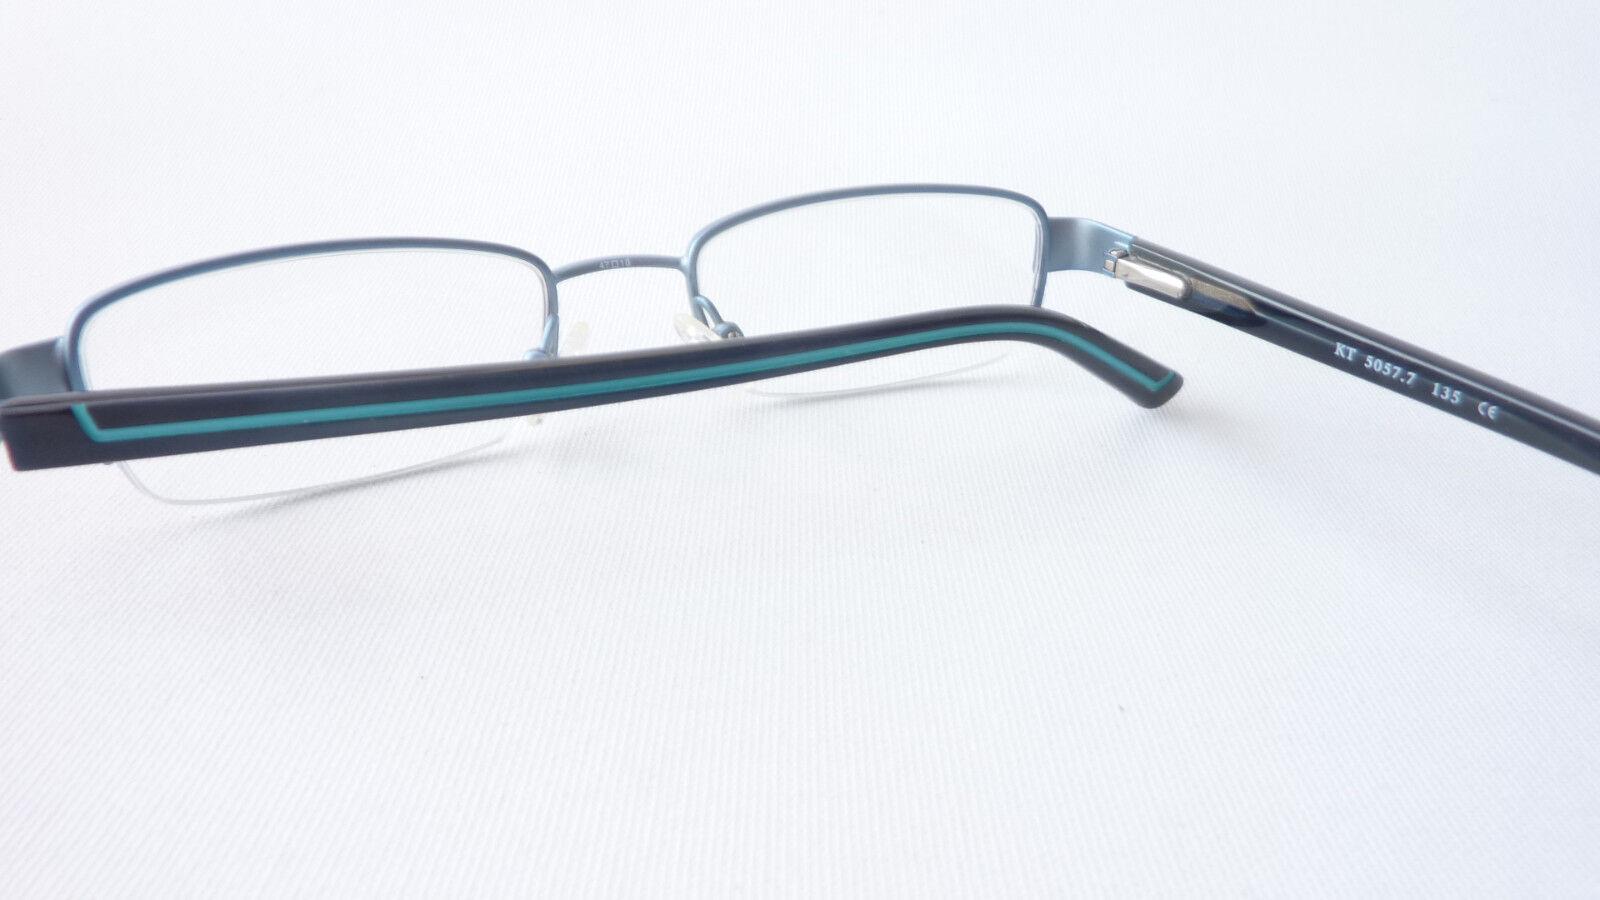 Metall Fassung Marken Gestell Gestell Gestell blau Brille schmal stabil Lesebrille Whynot Gr S | Erlesene Materialien  884d30